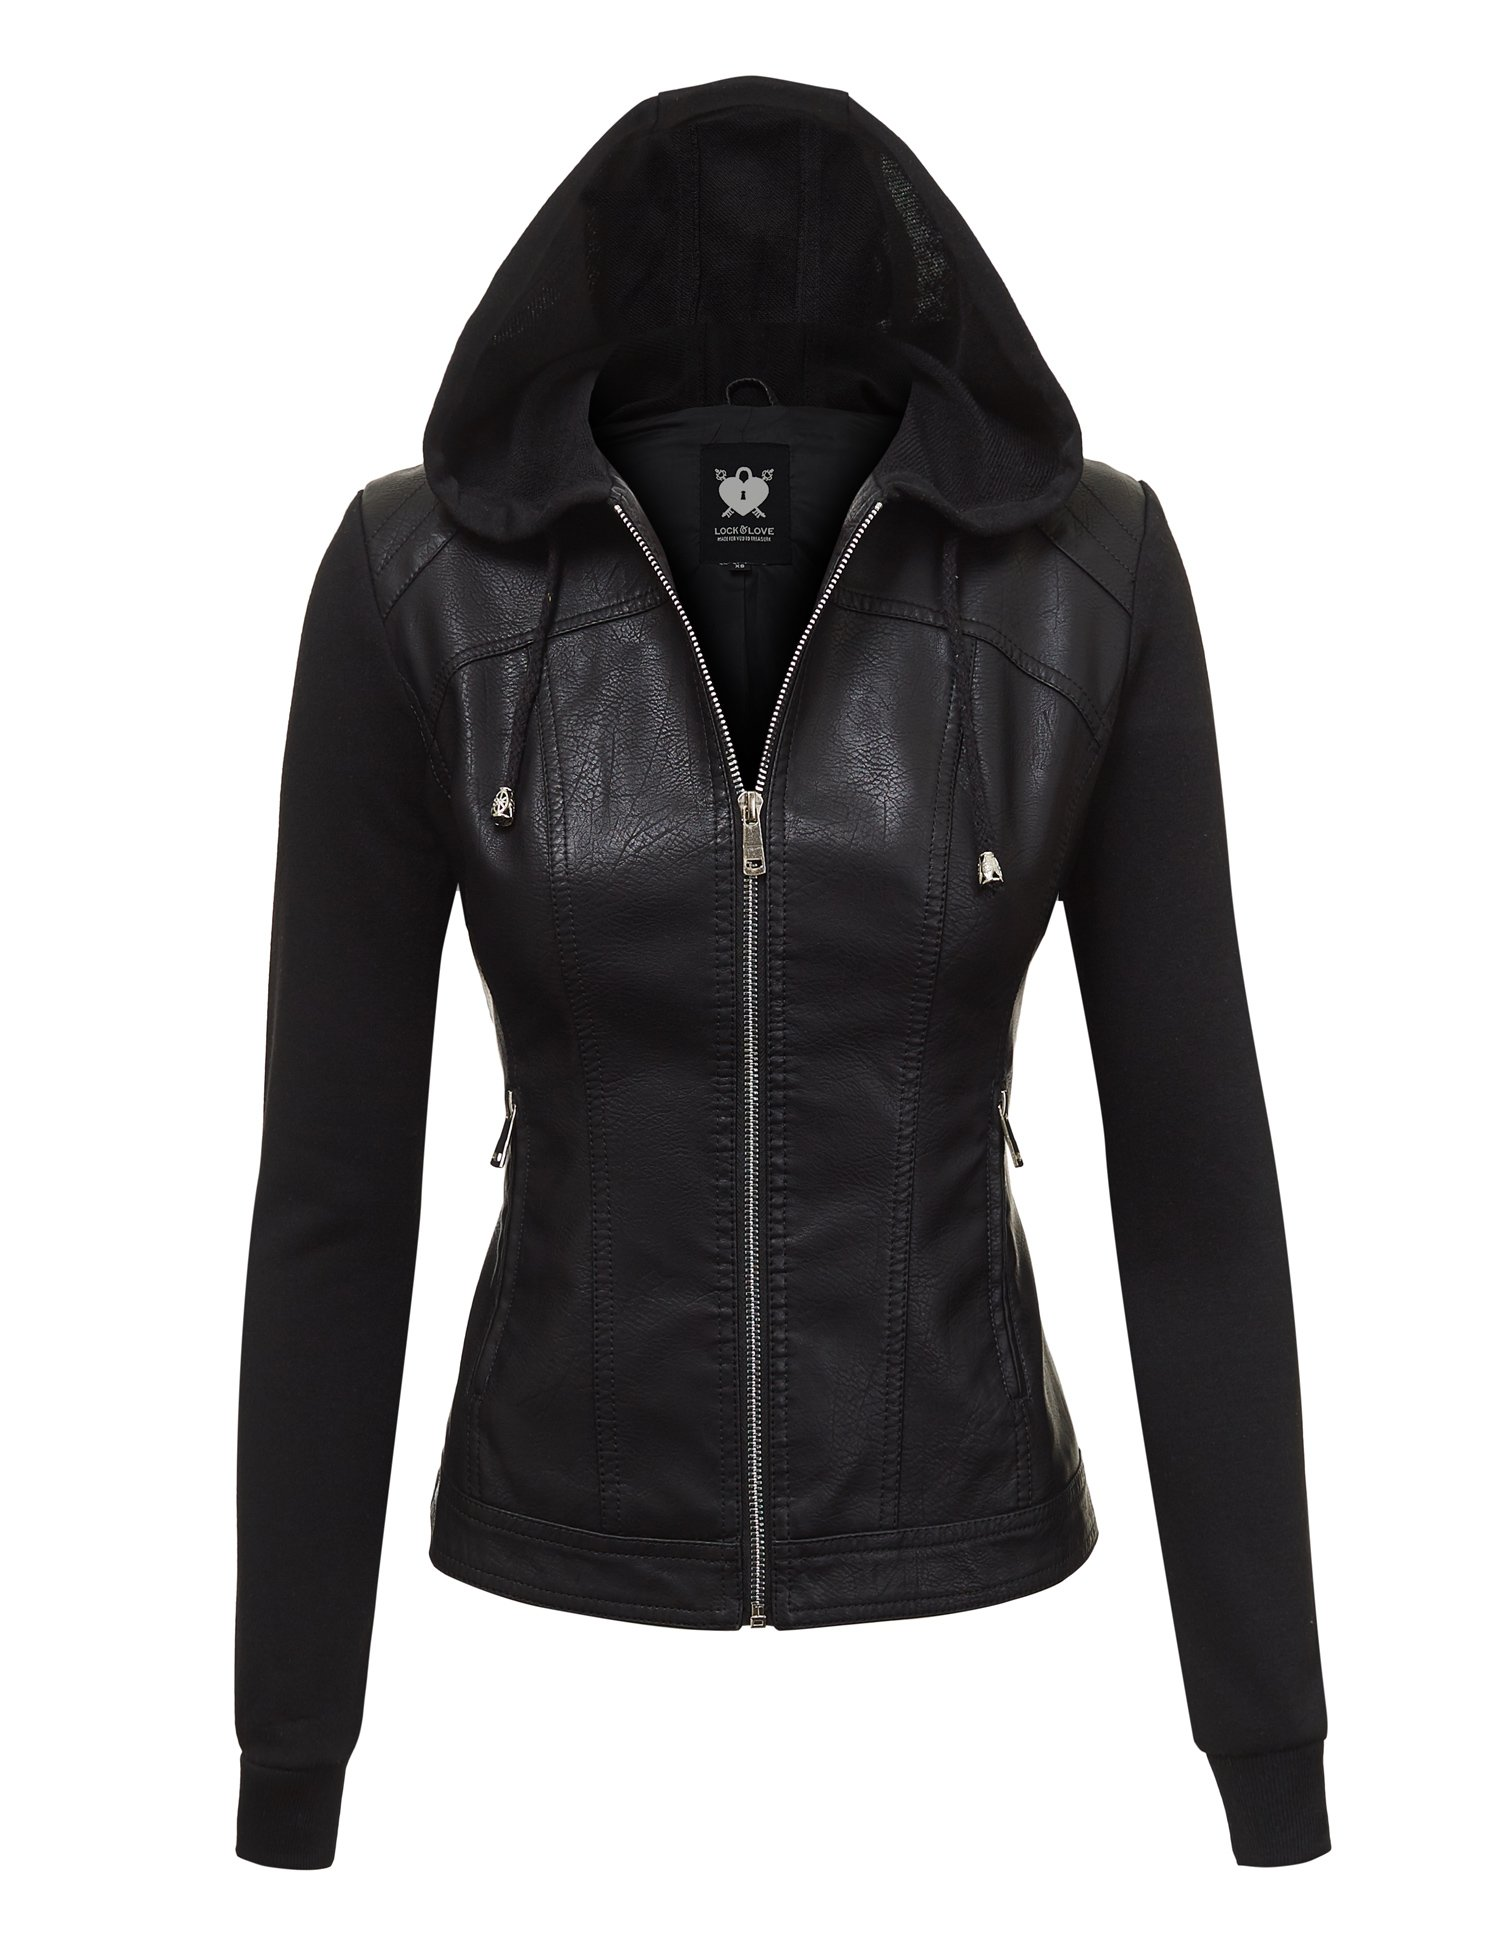 WJC1347 Womens Faux Leather Zip Up Moto Biker Jacket With Hoodie L Black_Black